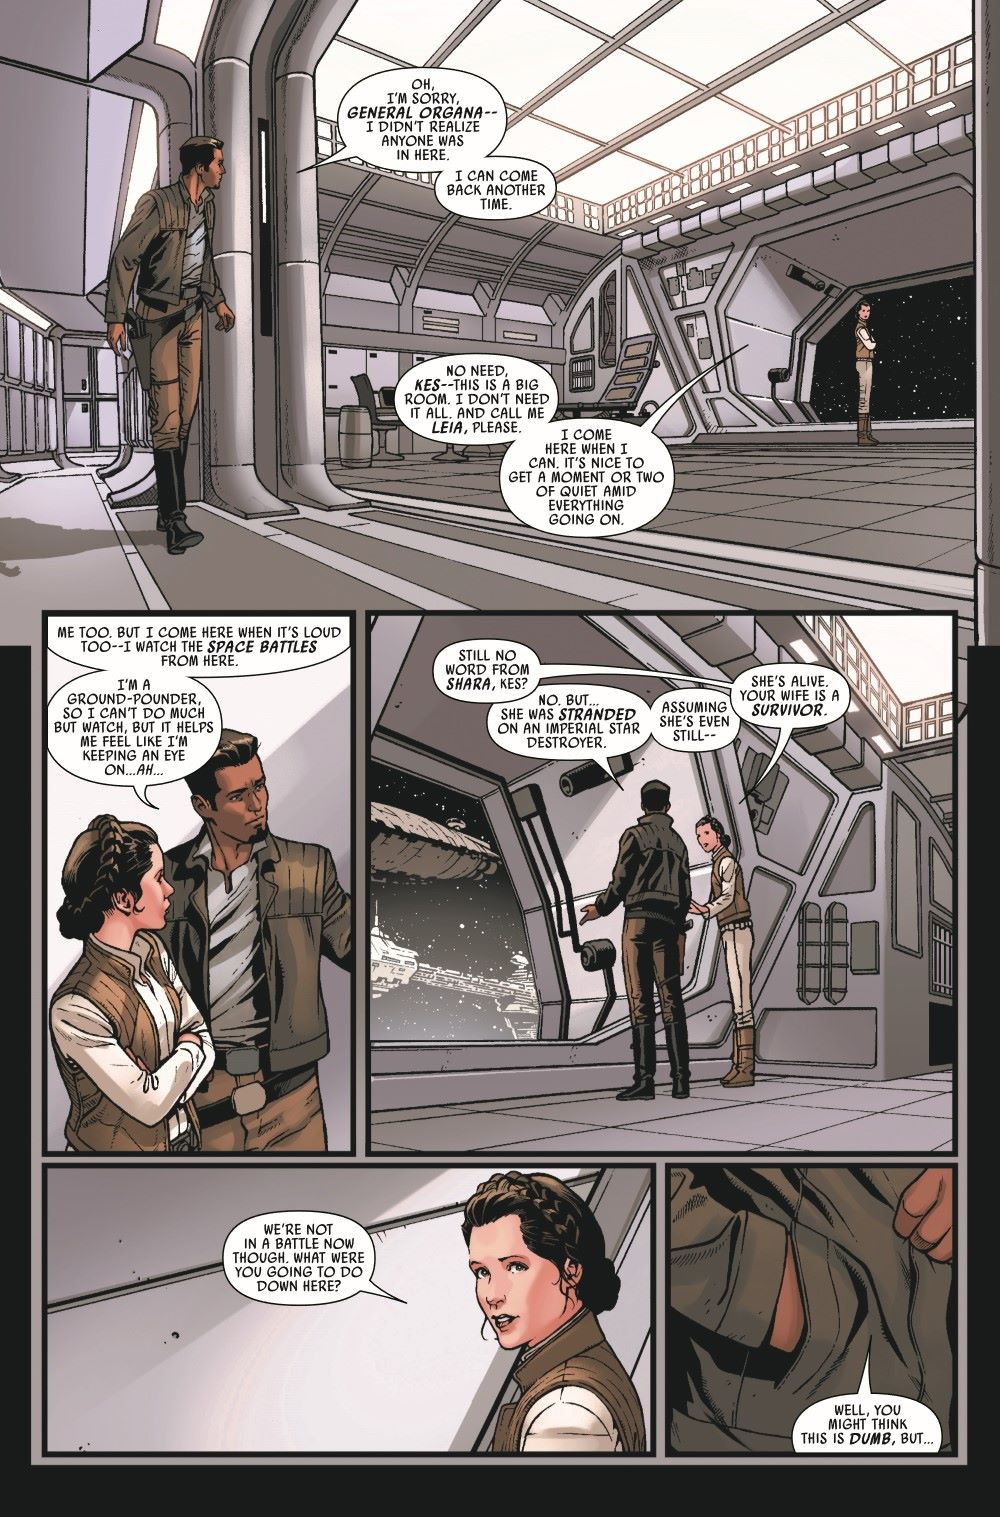 STWARS2020012_Preview-4 ComicList Previews: STAR WARS #12